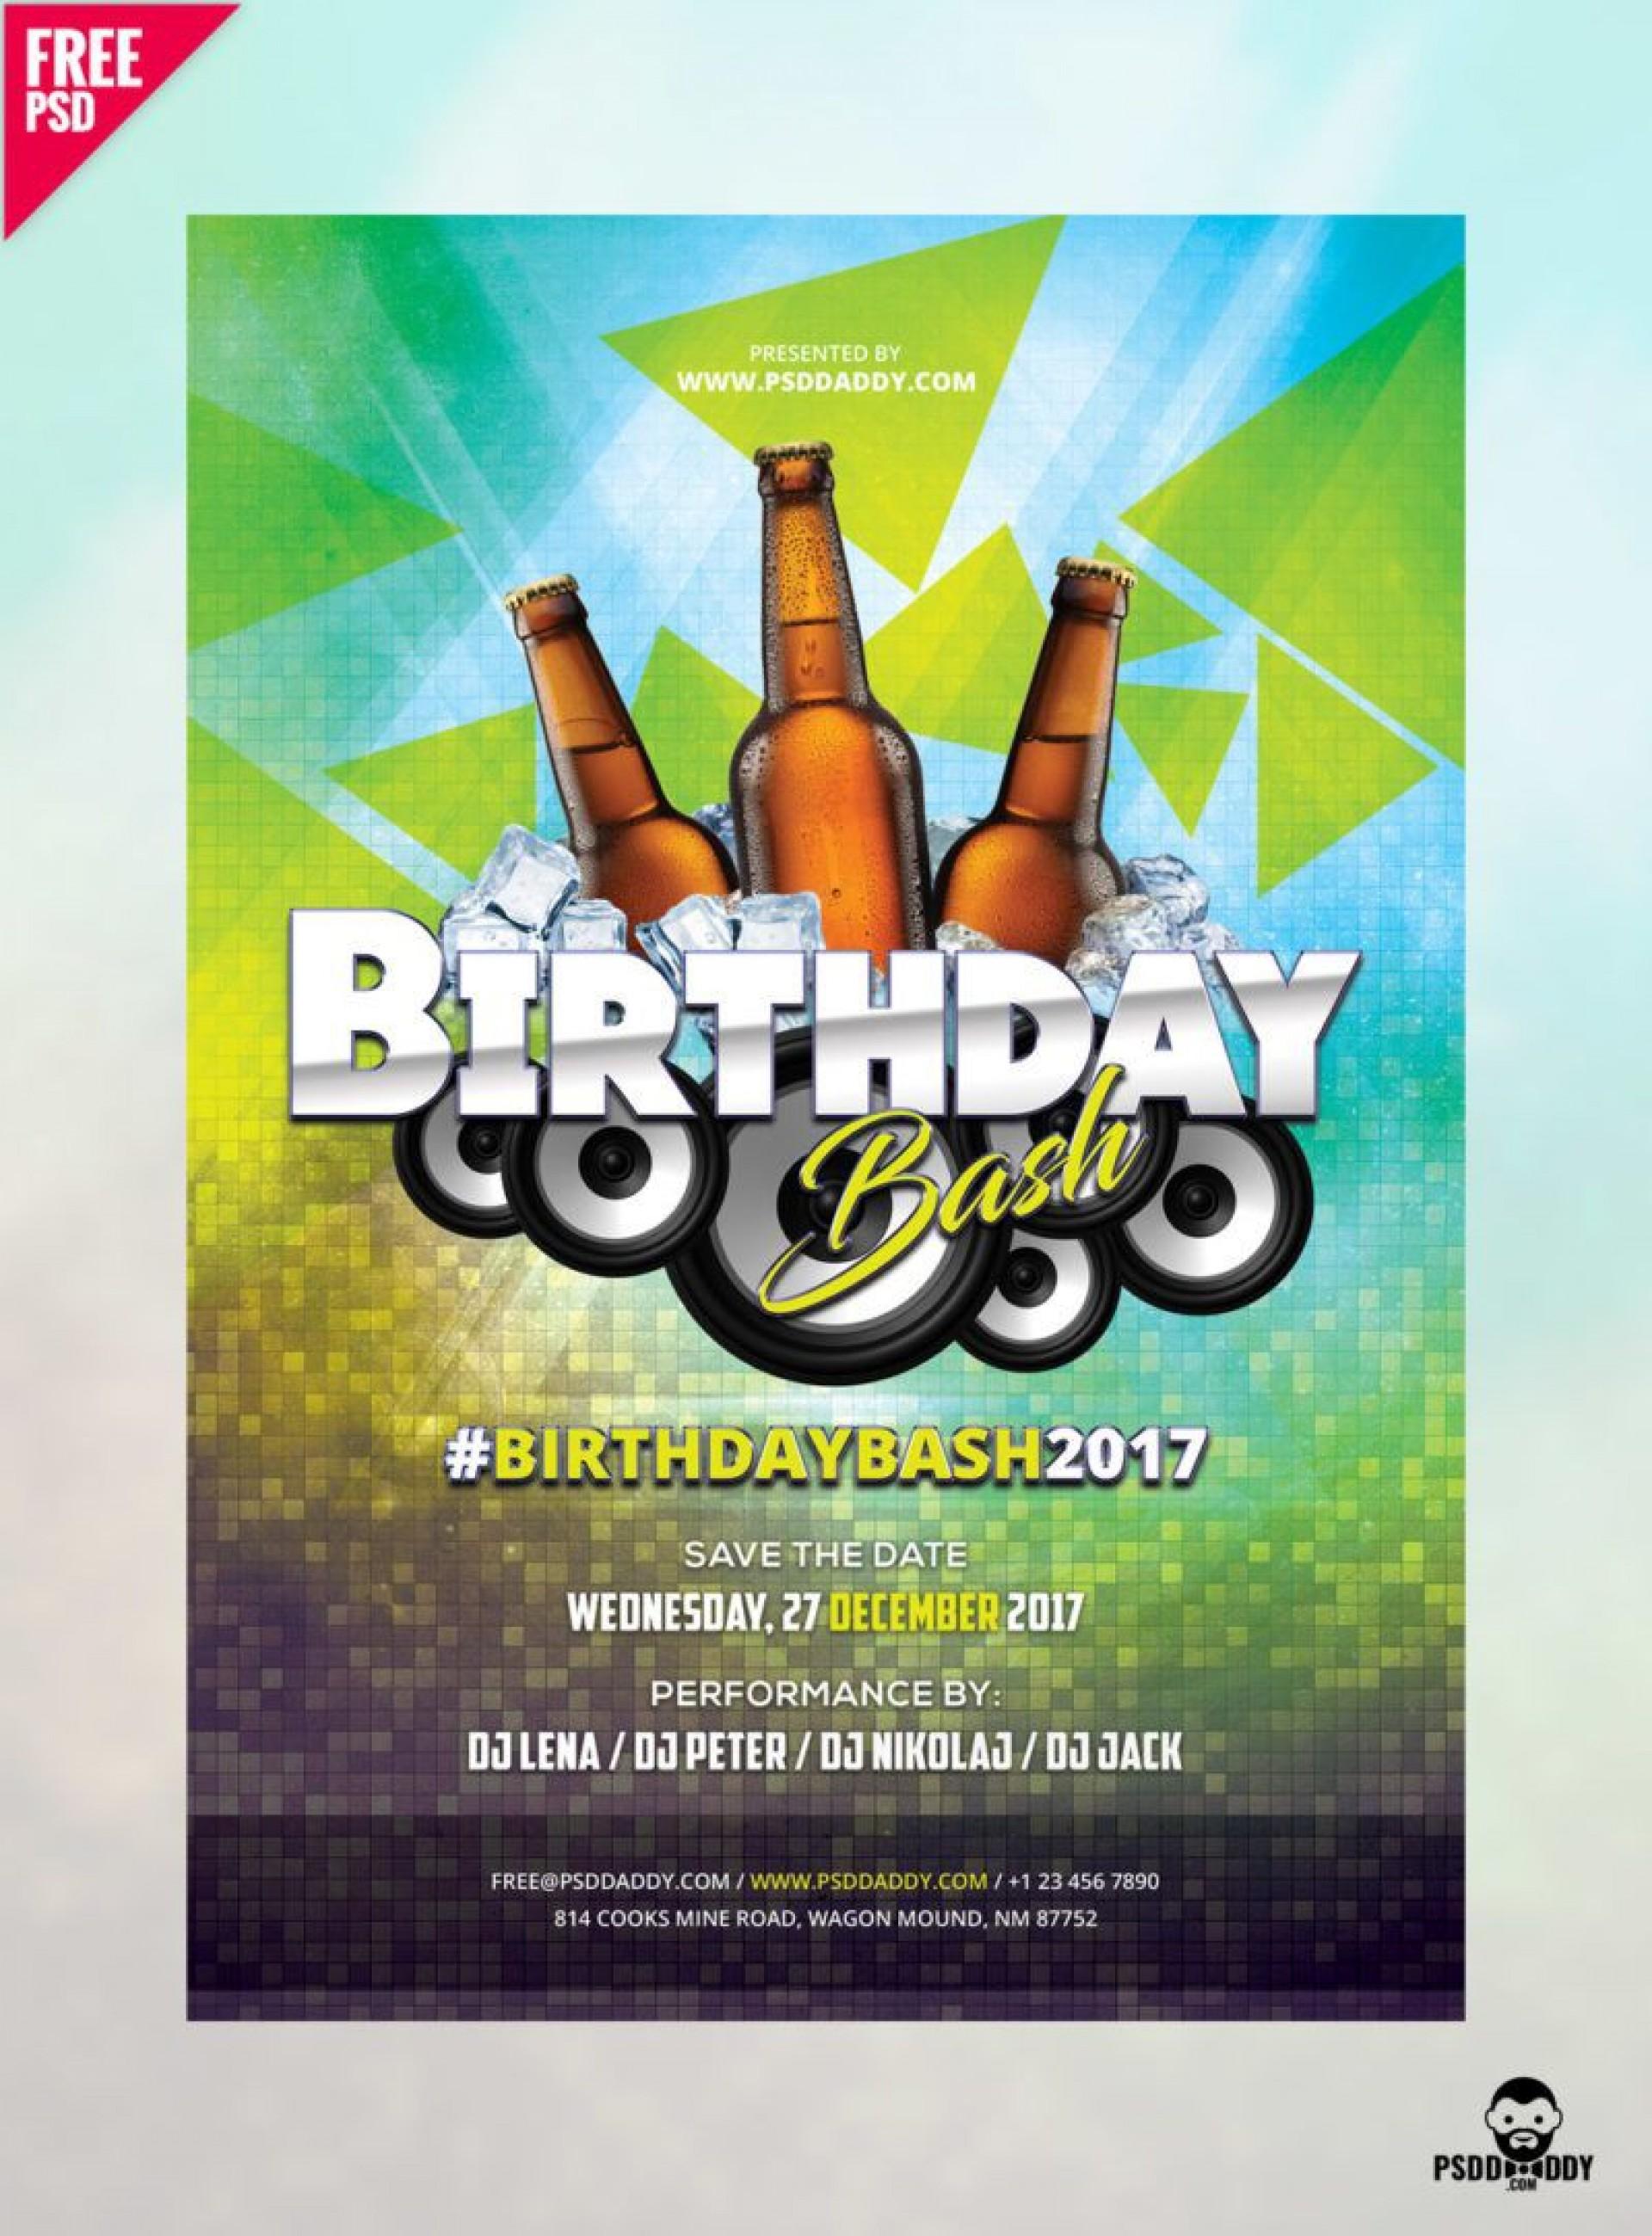 005 Sensational Free Birthday Flyer Template Psd Image  Foam Party - Neon Glow Download Pool1920